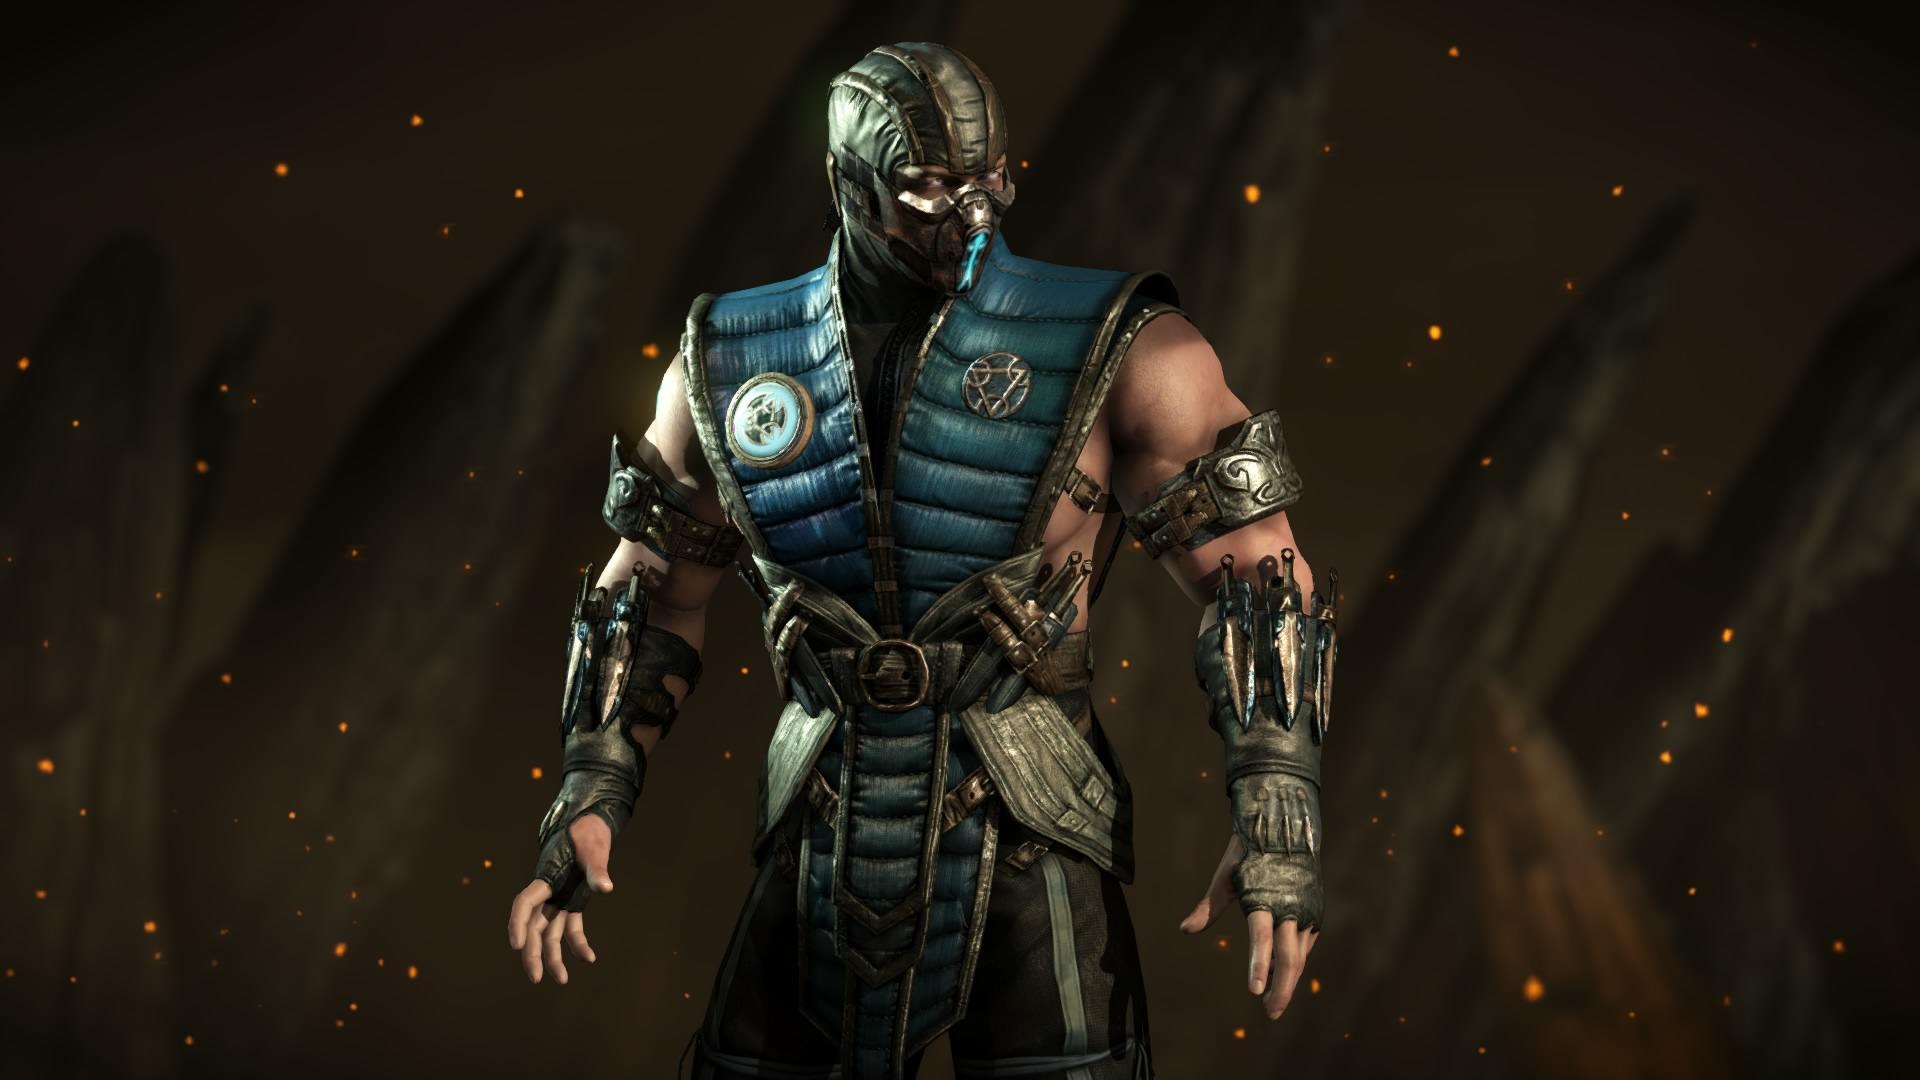 Mortal Kombat X Sub Zero By Kabukiart157 On Deviantart